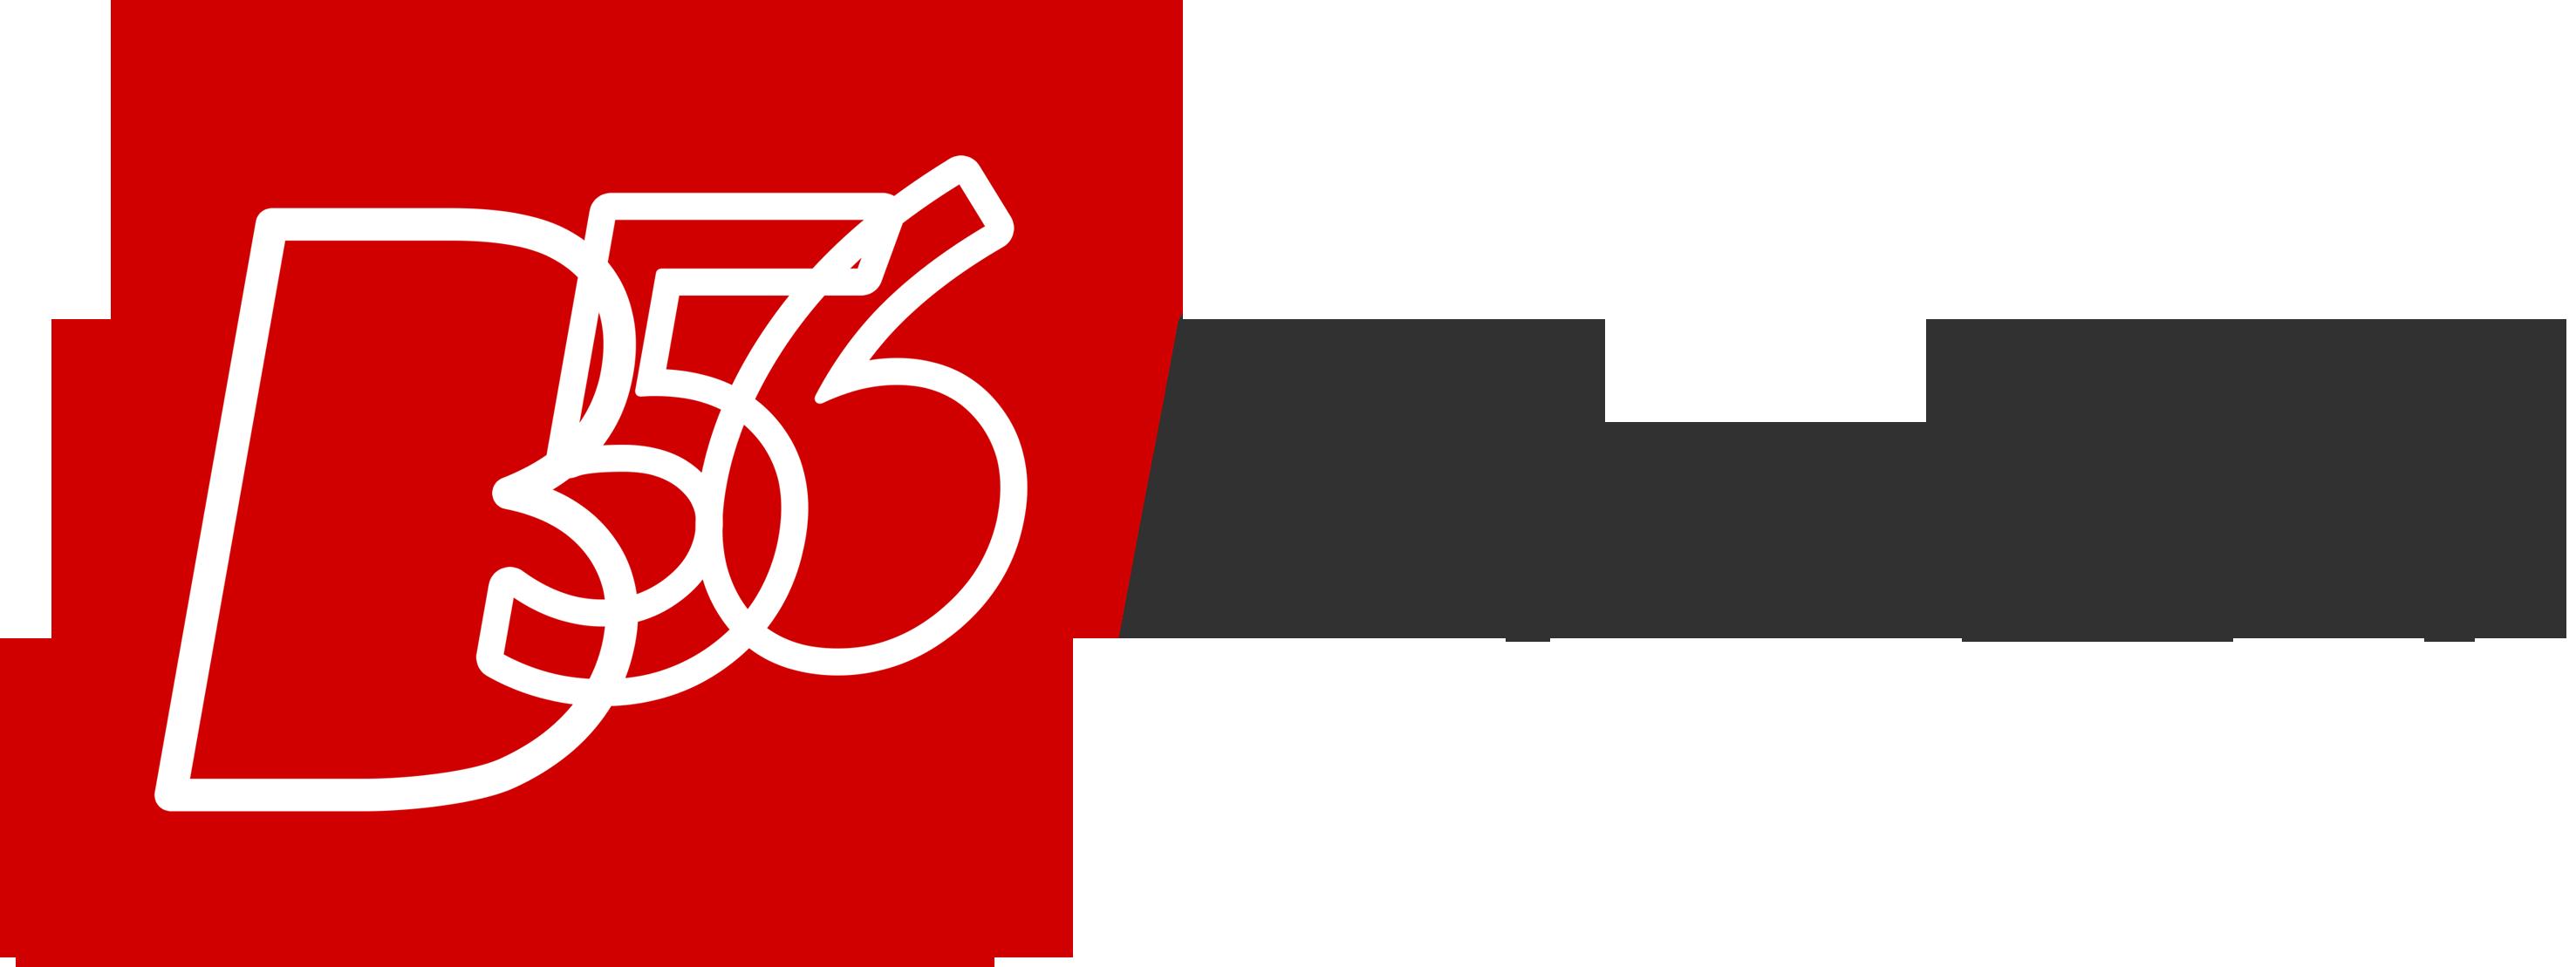 Buro 56